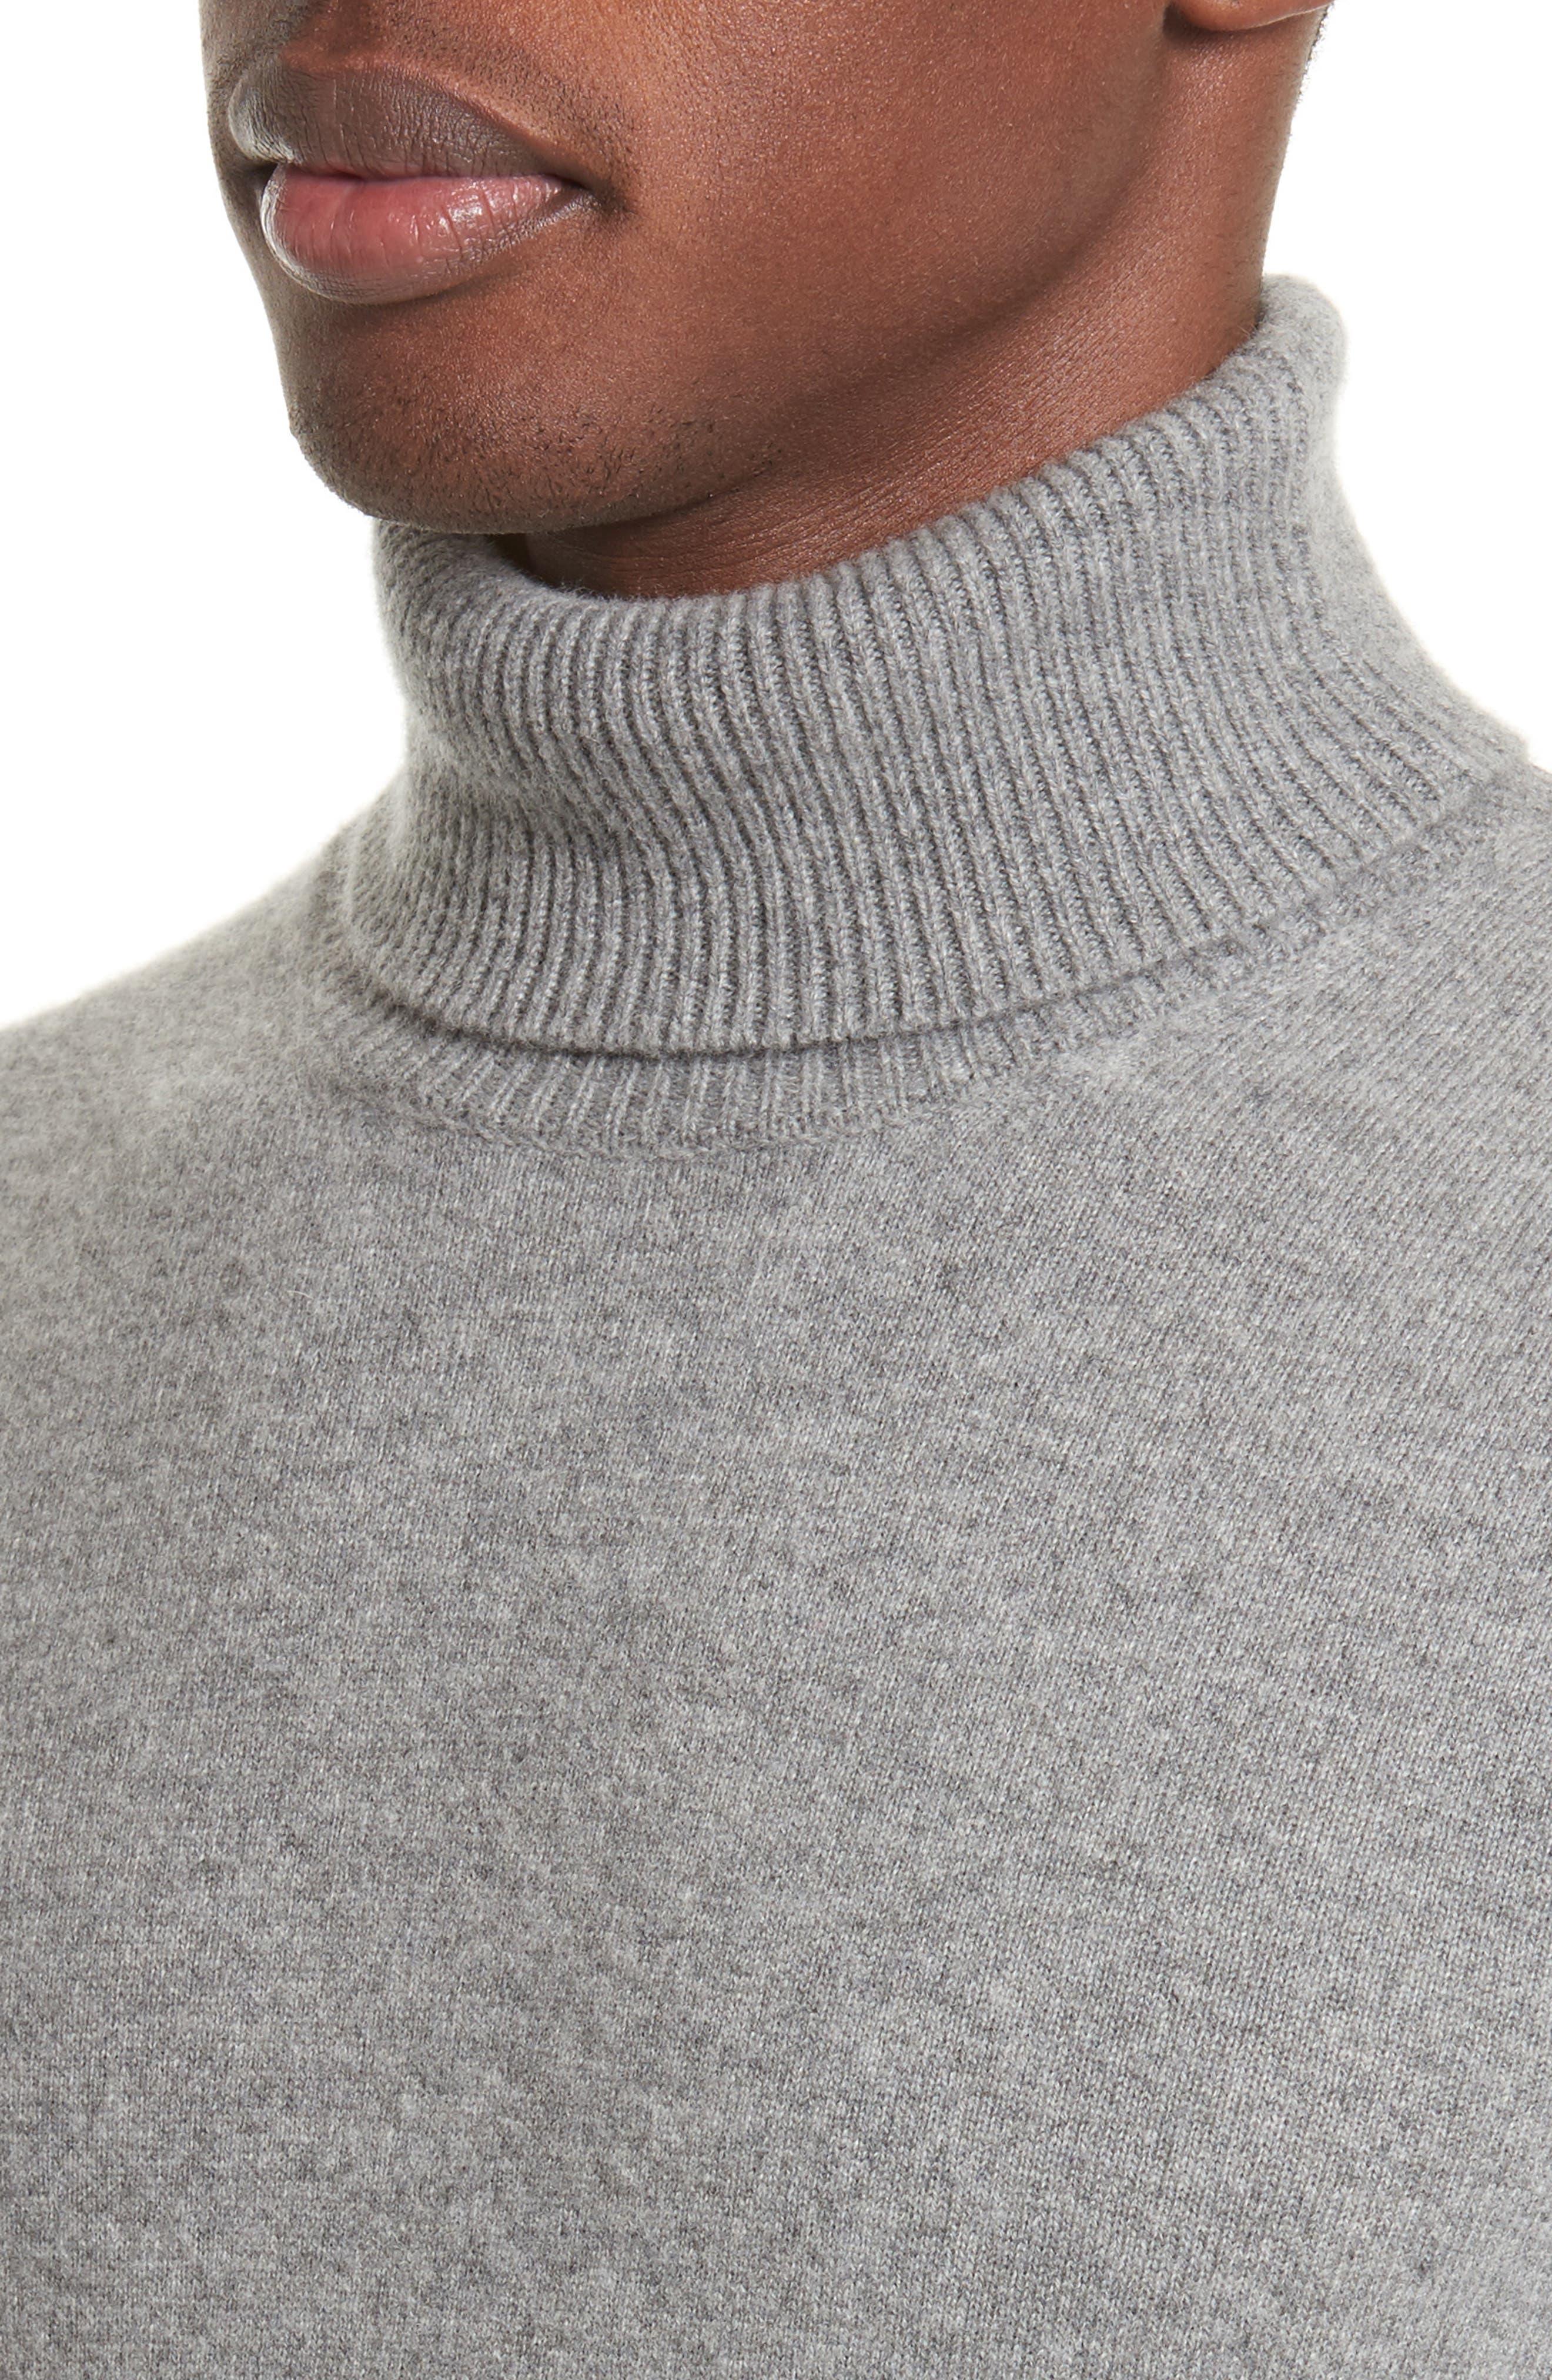 Turtleneck Sweater,                             Alternate thumbnail 4, color,                             Grey